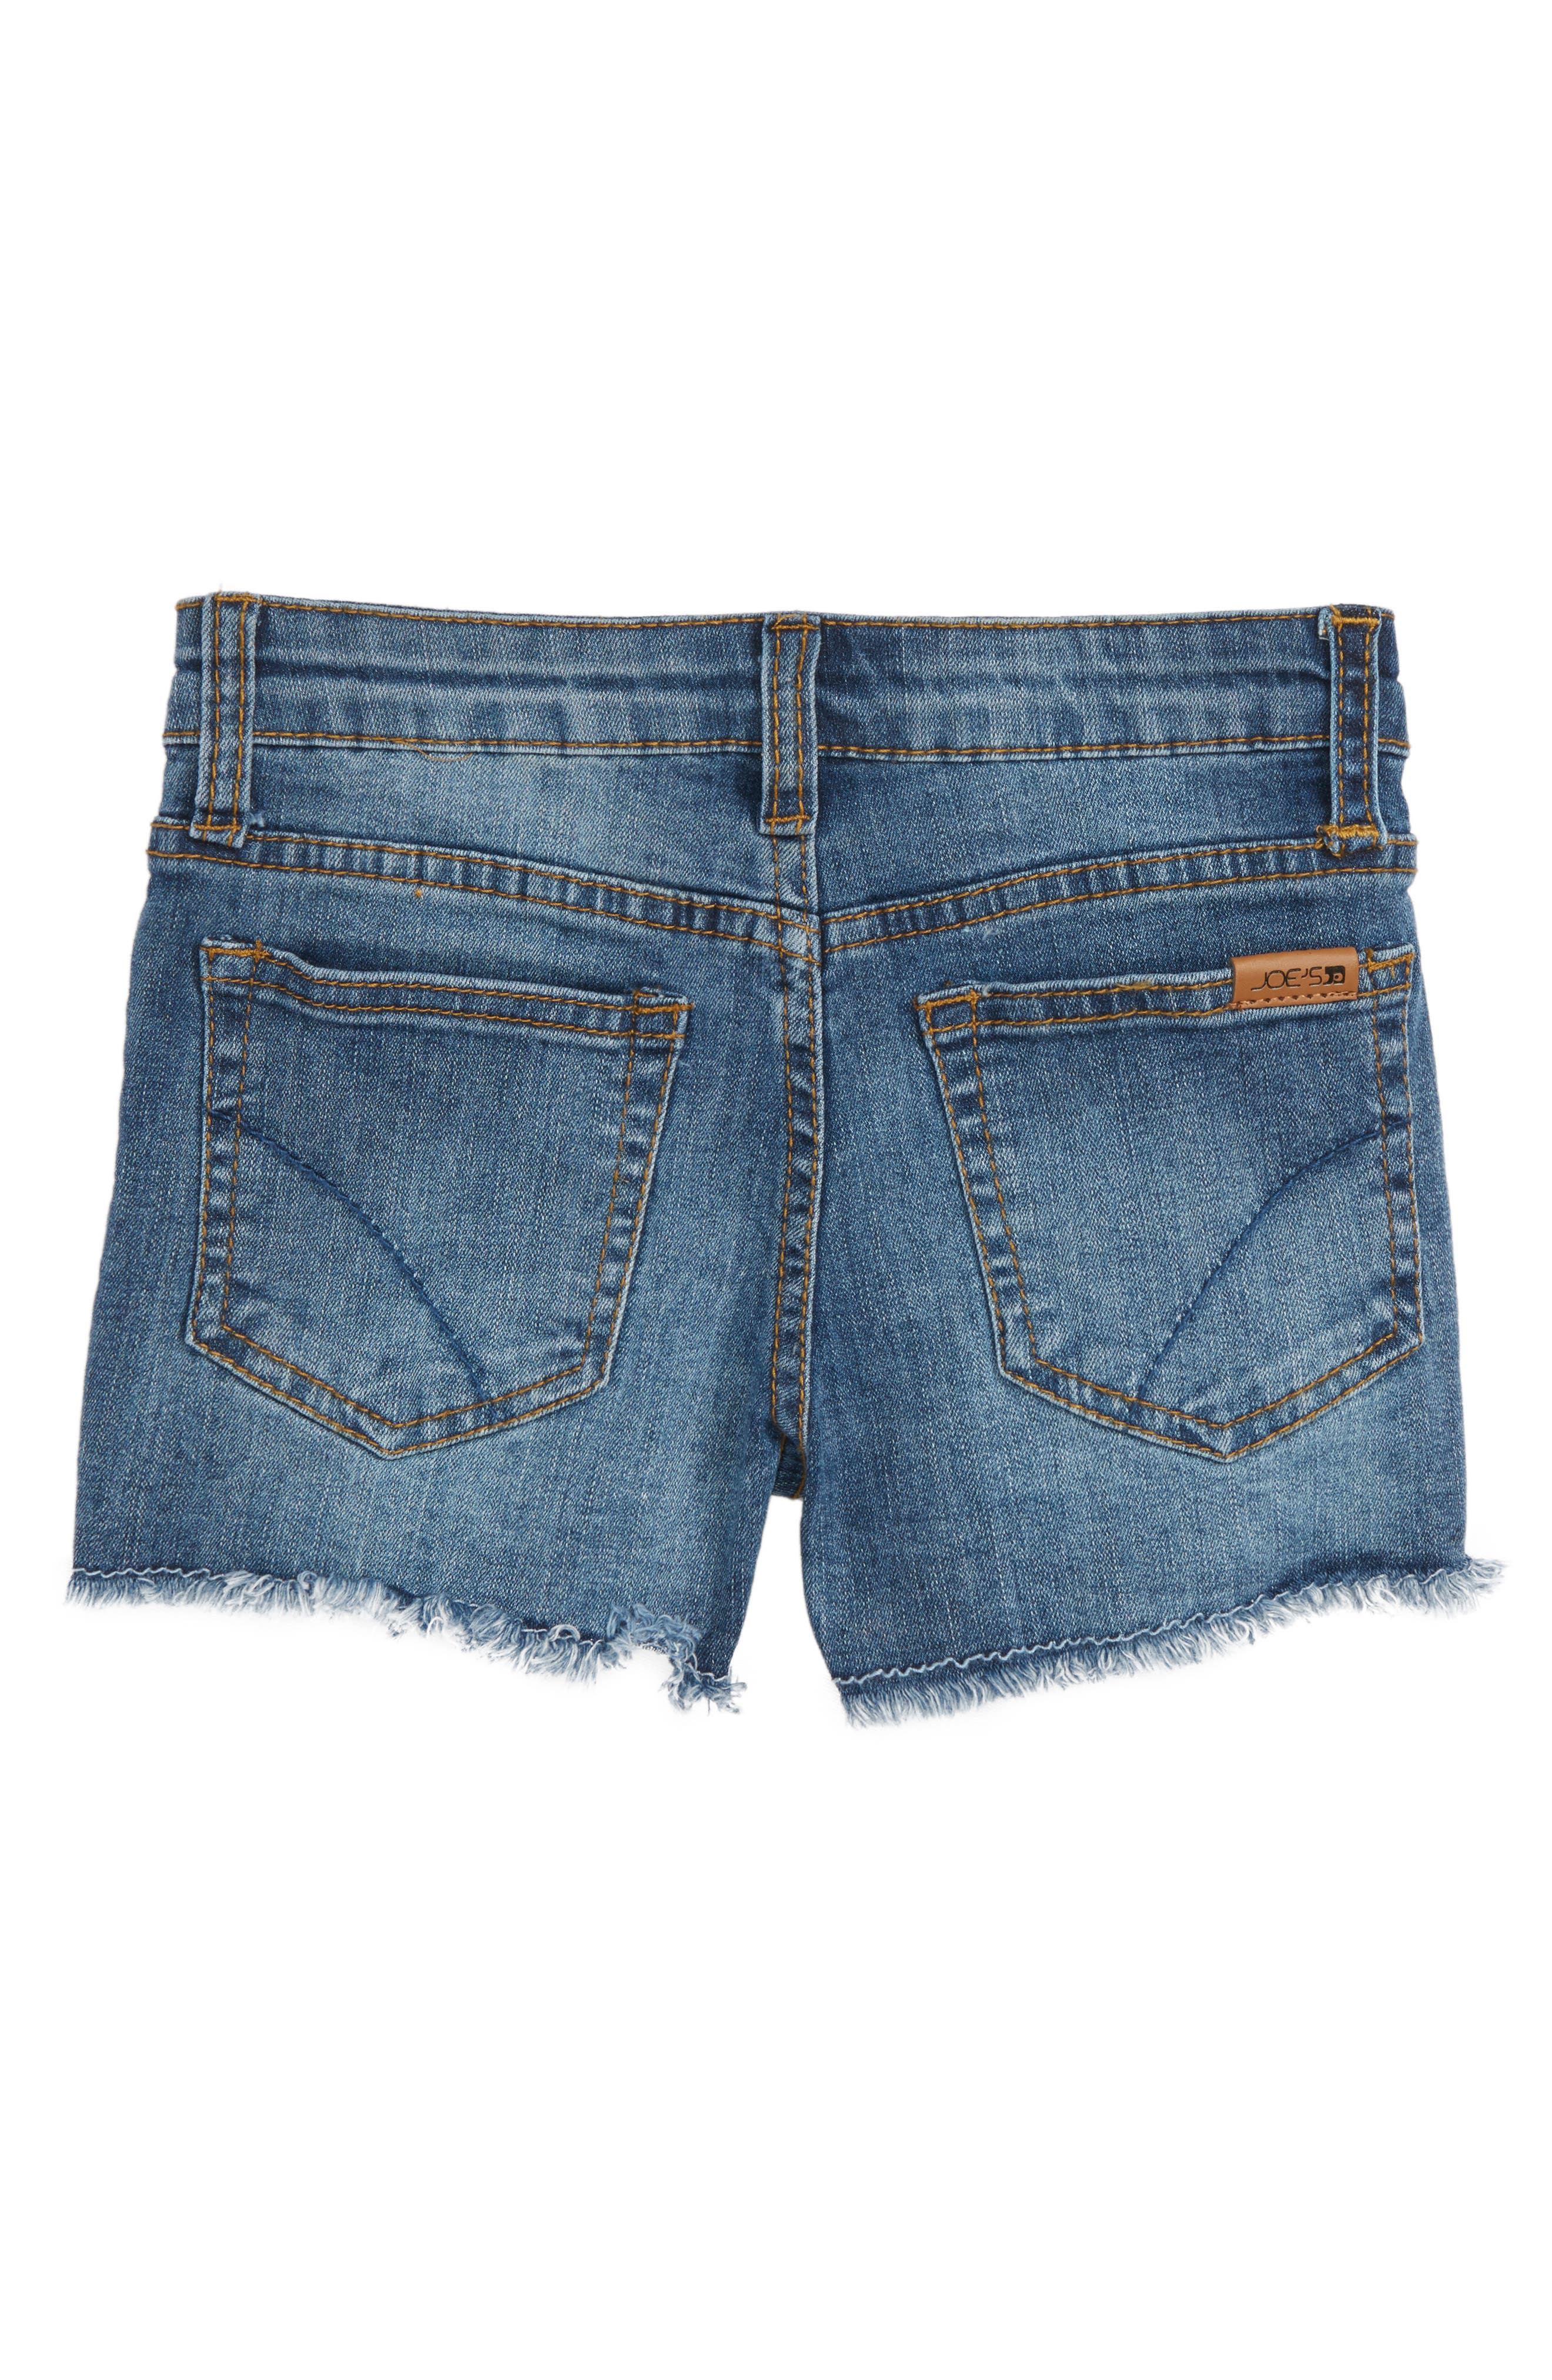 Markie Cutoff Denim Shorts,                             Alternate thumbnail 5, color,